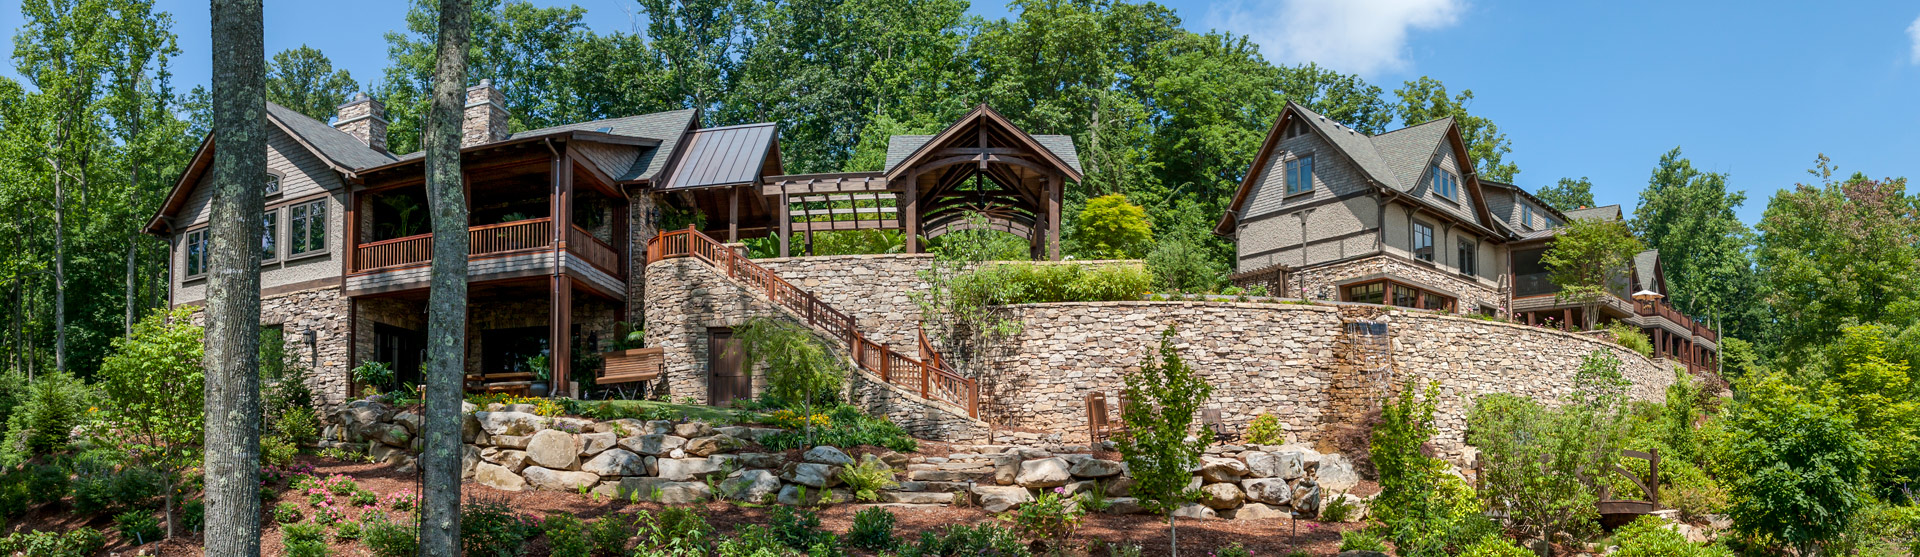 Custom Mountain Home Designed by ACM Design